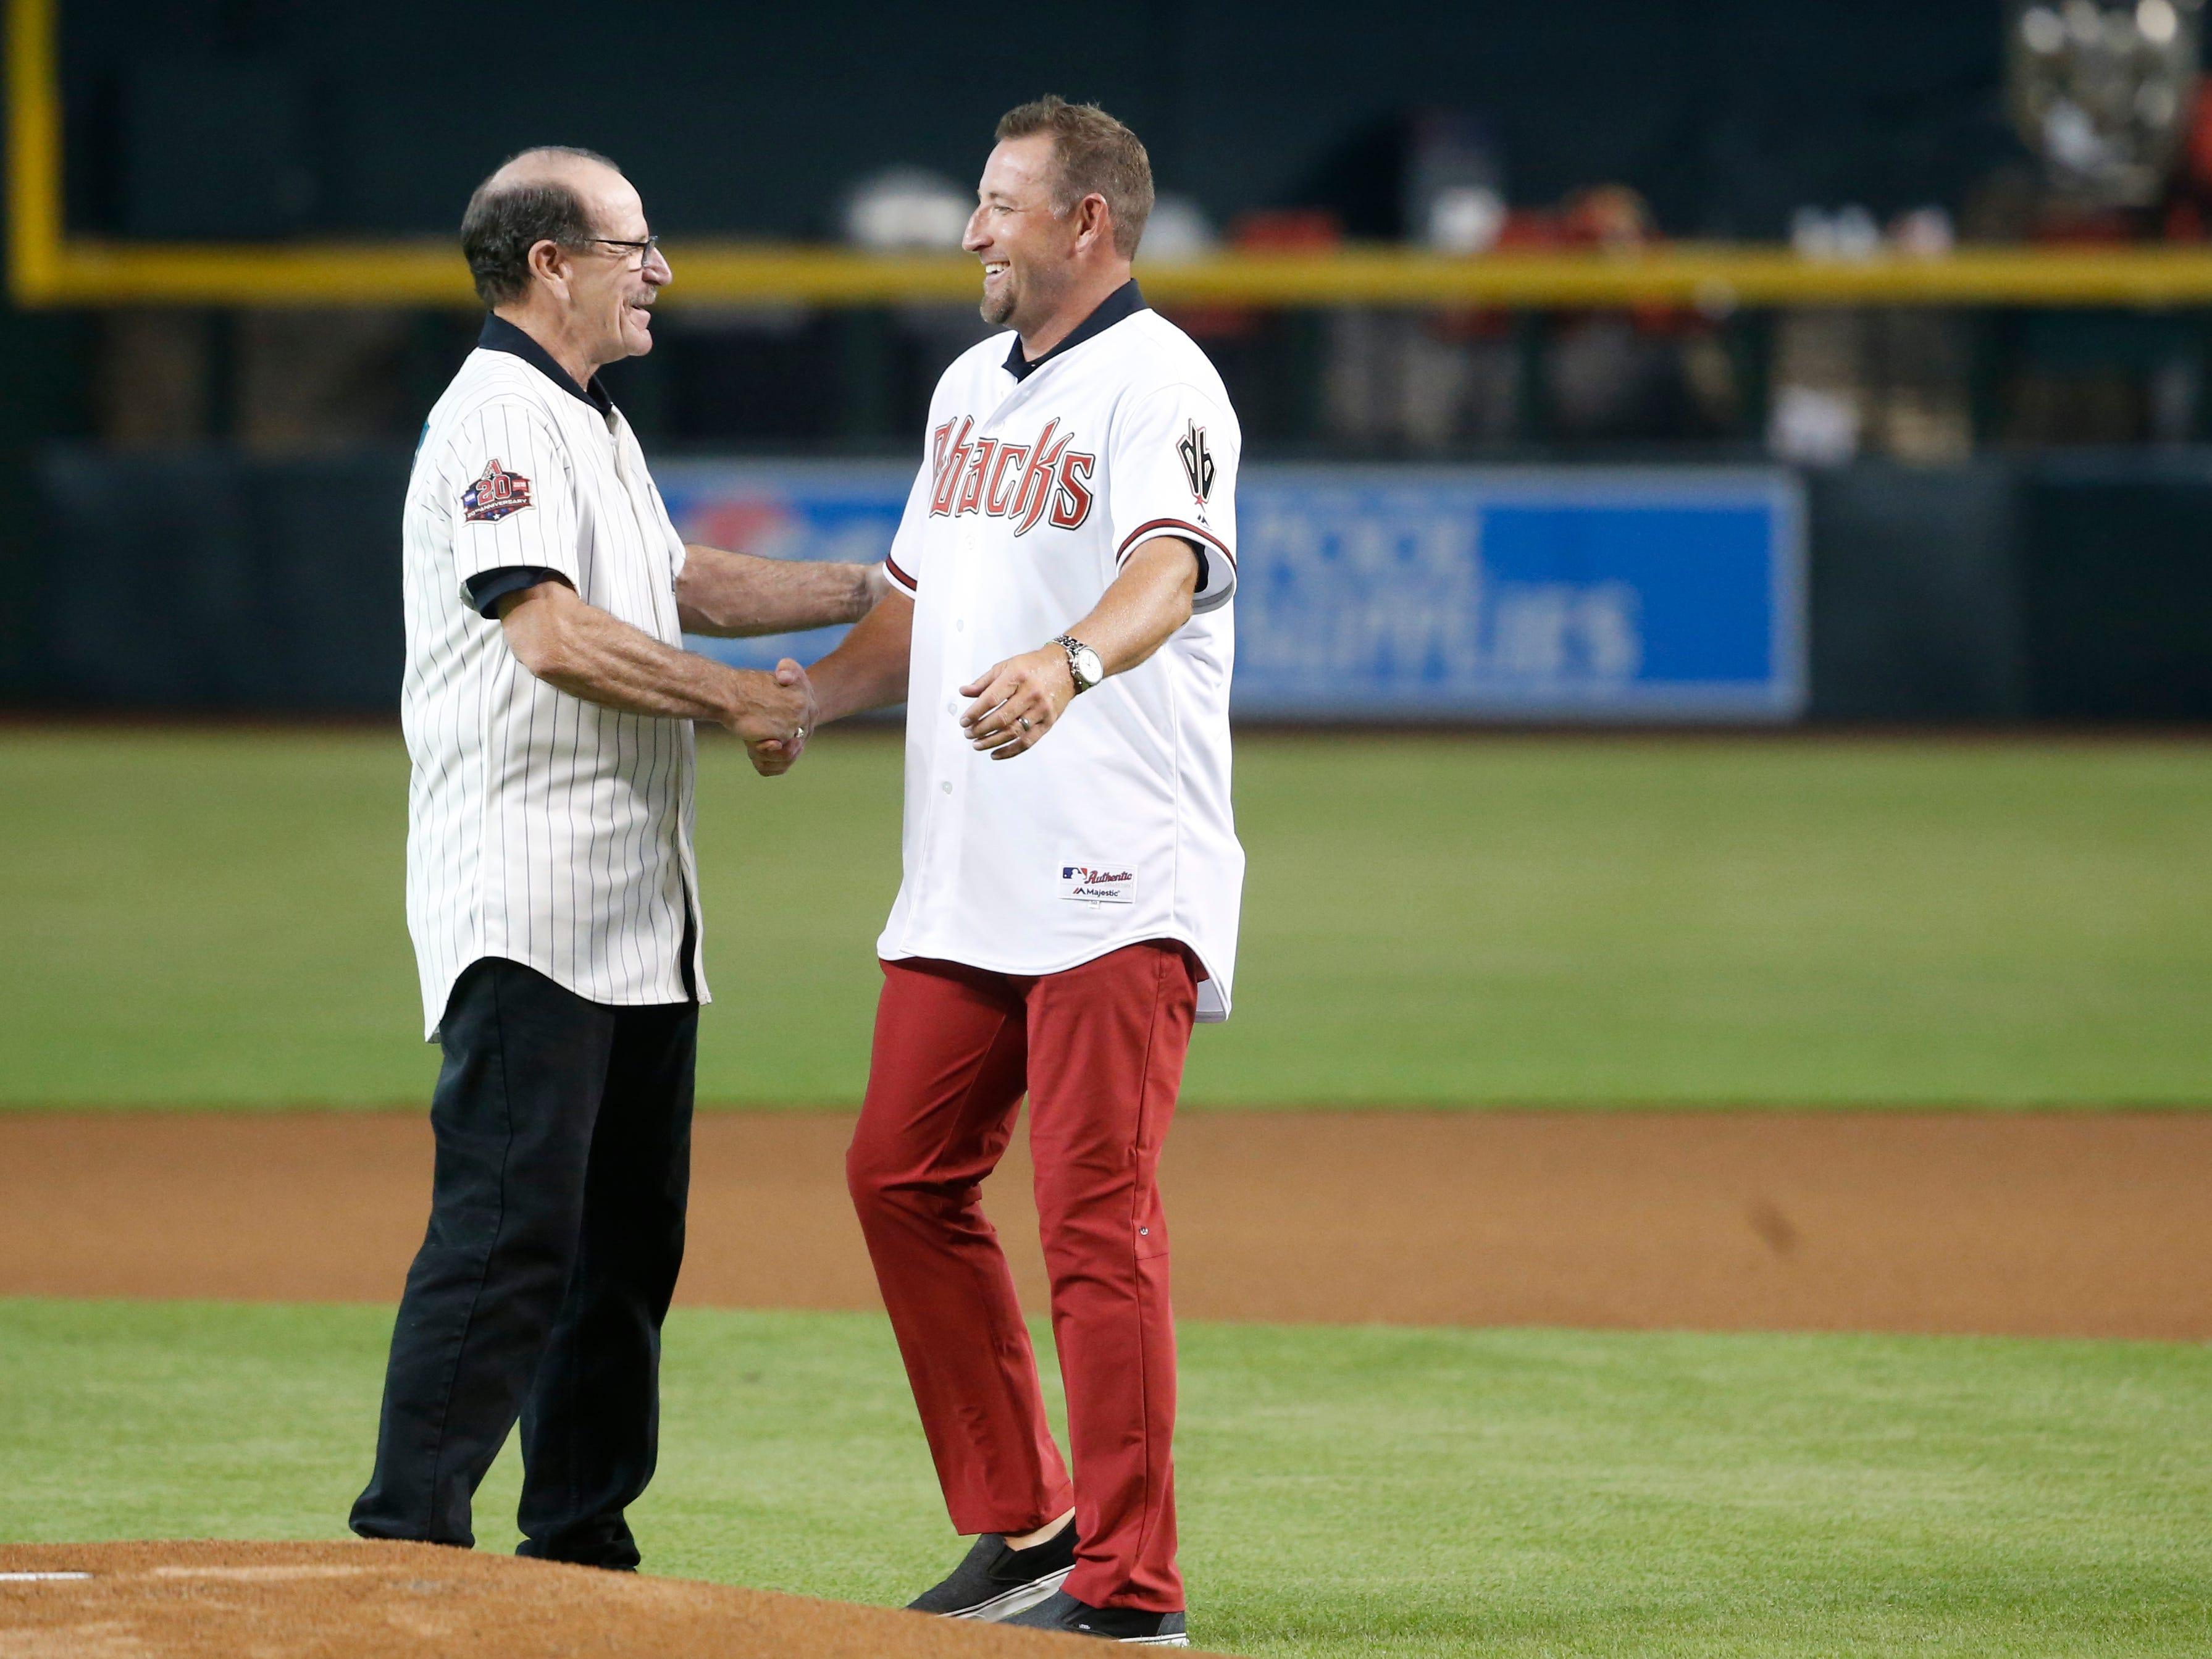 Former Diamondbacks manager Bob Brenly greets pitcher Brandon Webb, both chosen for the Diamondbacks 20th Anniversary team prior to a Diamondbacks game at Chase Field in Phoenix, Ariz. on Aug. 4, 2018.